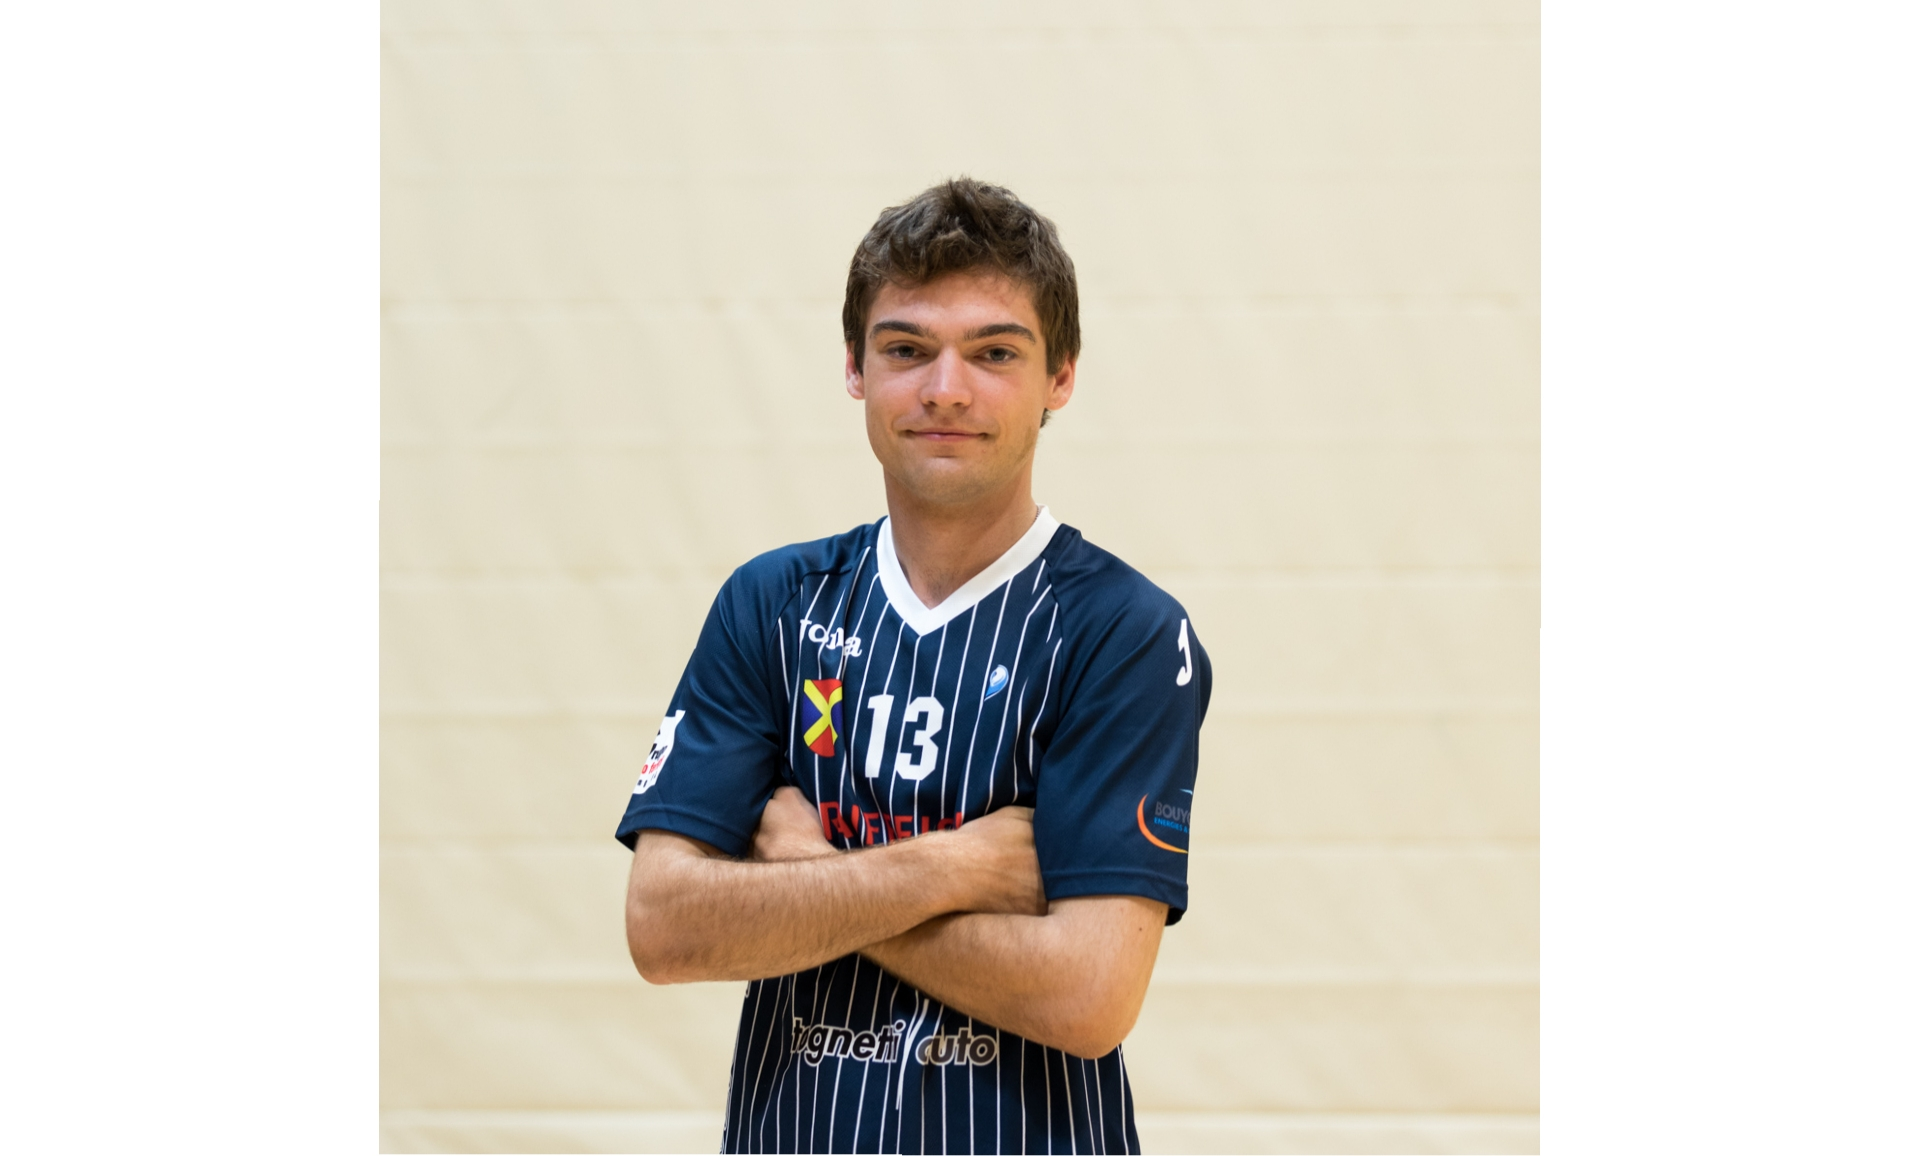 LNB: Fra militare e Unihockey: scopriamo Noel Frapolli